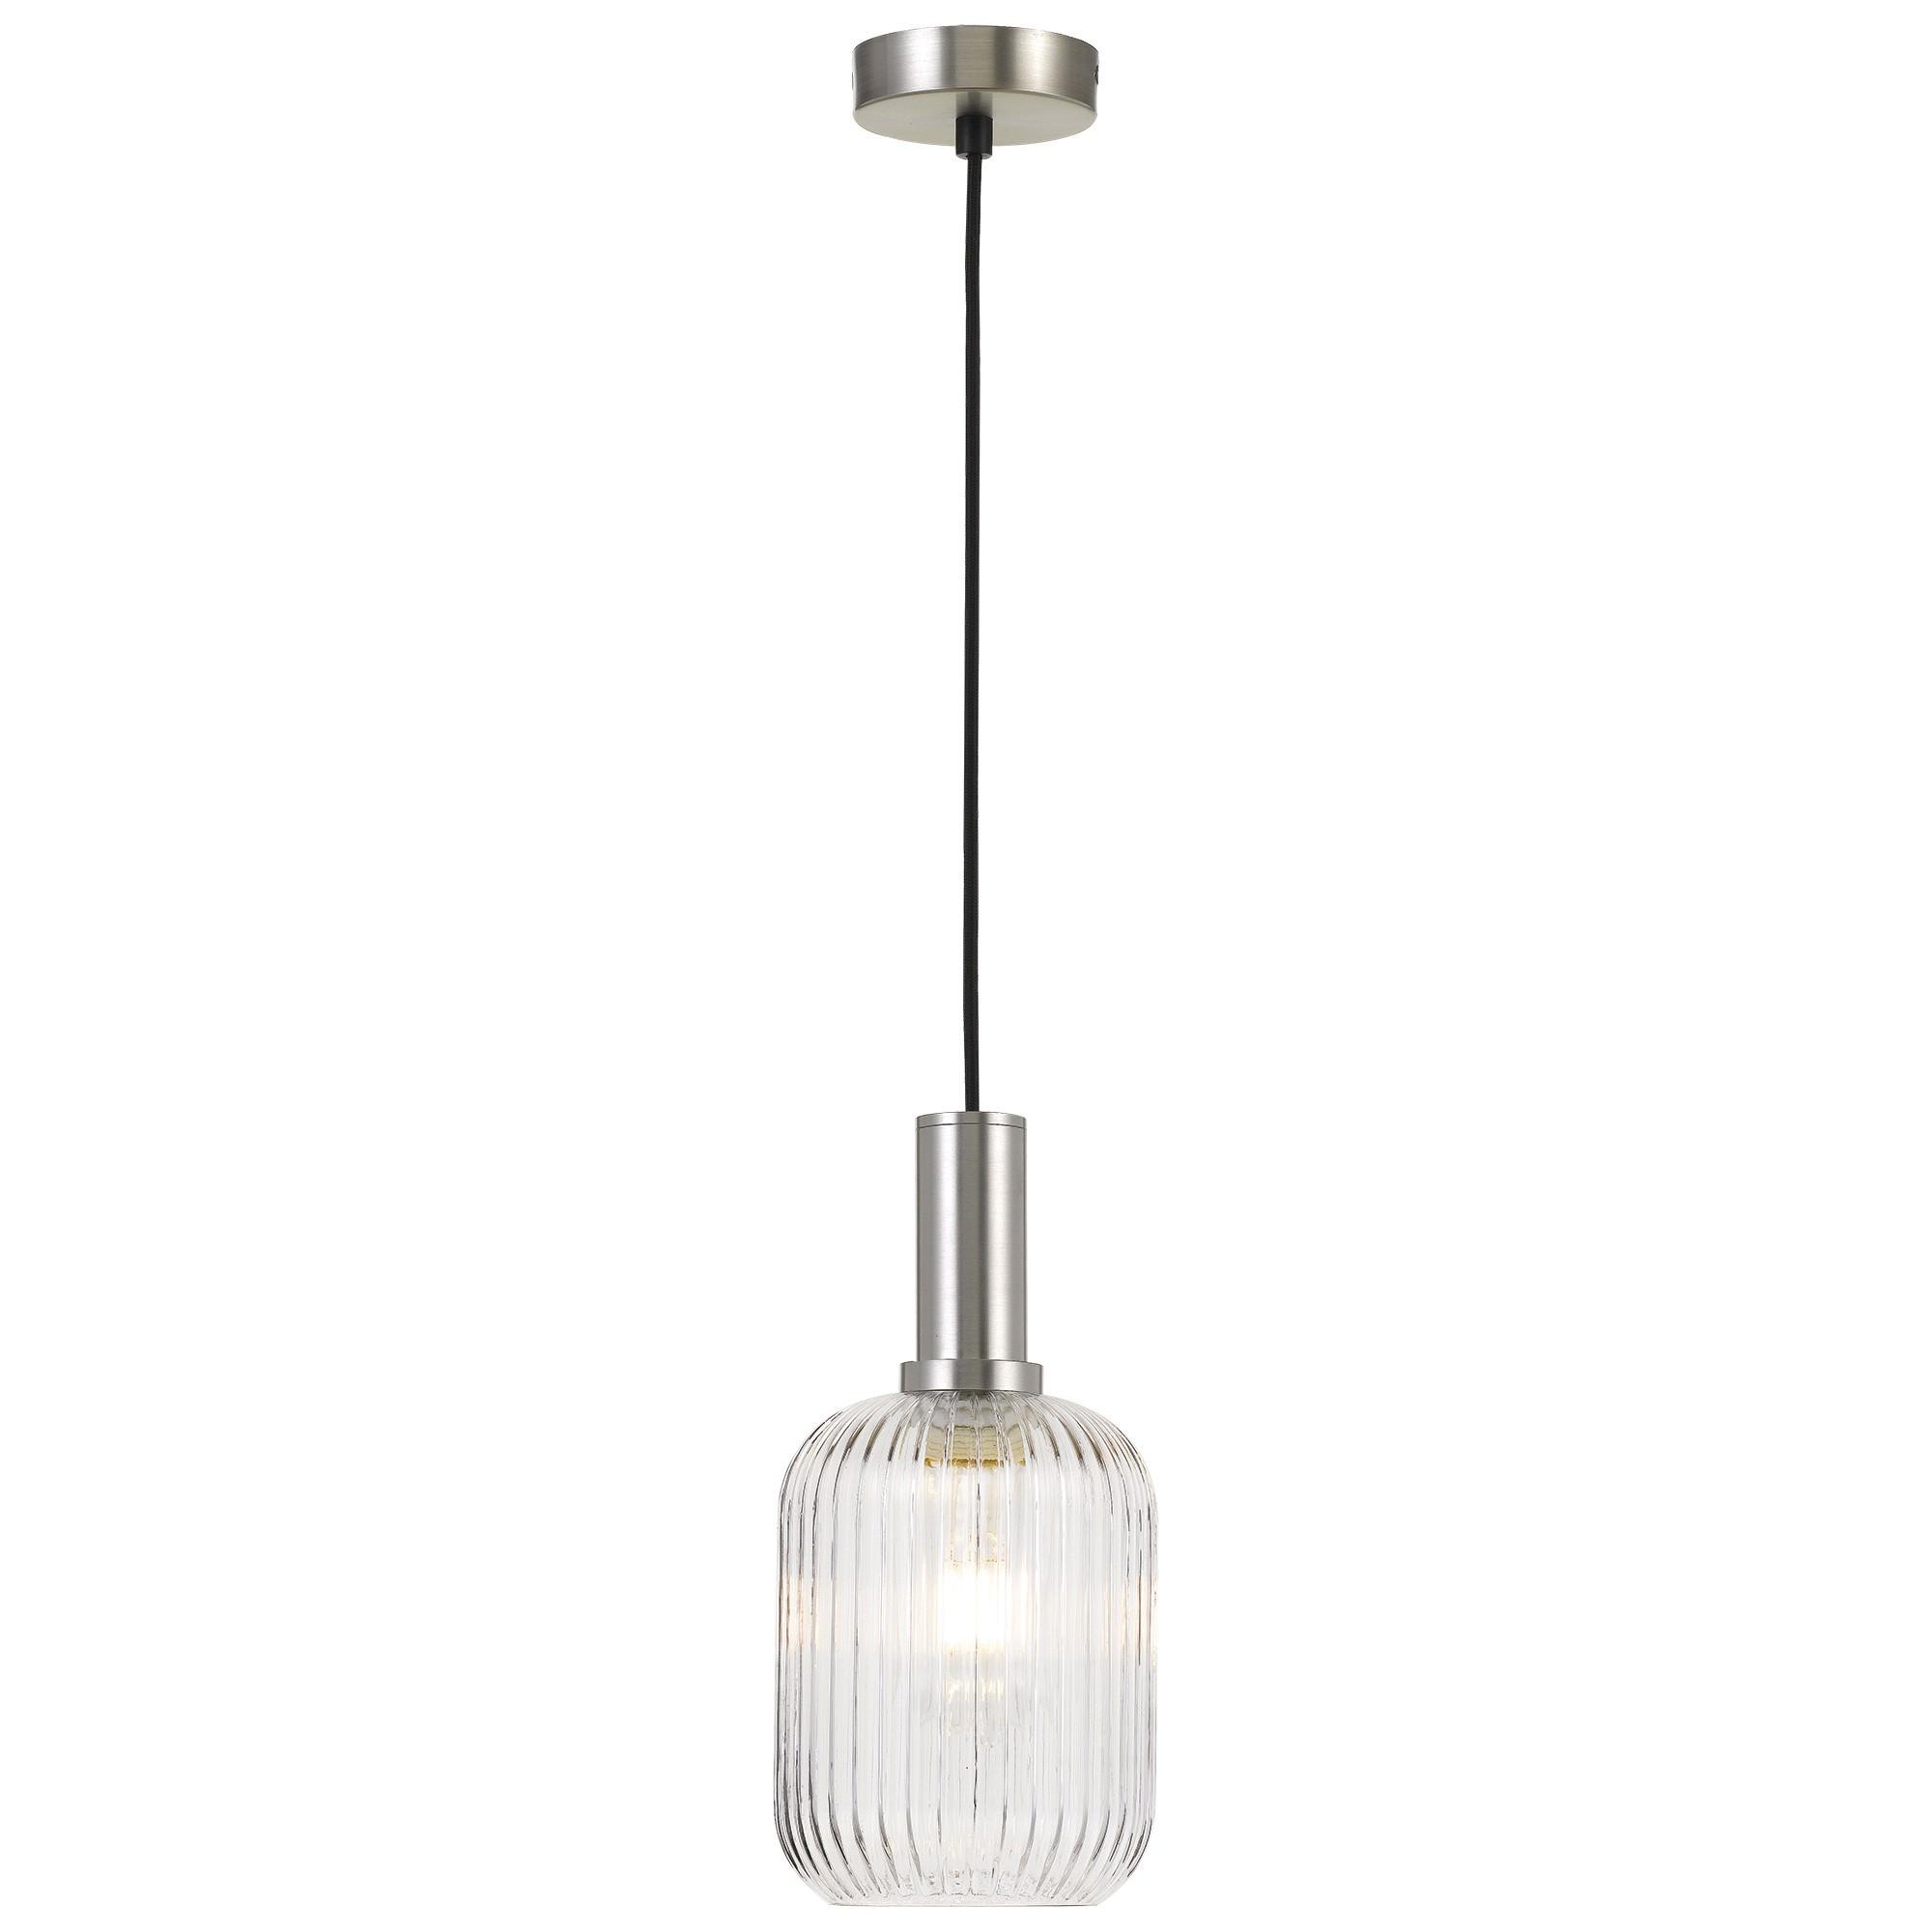 Bonura Ribbed Glass Pendant Light, Small, Clear